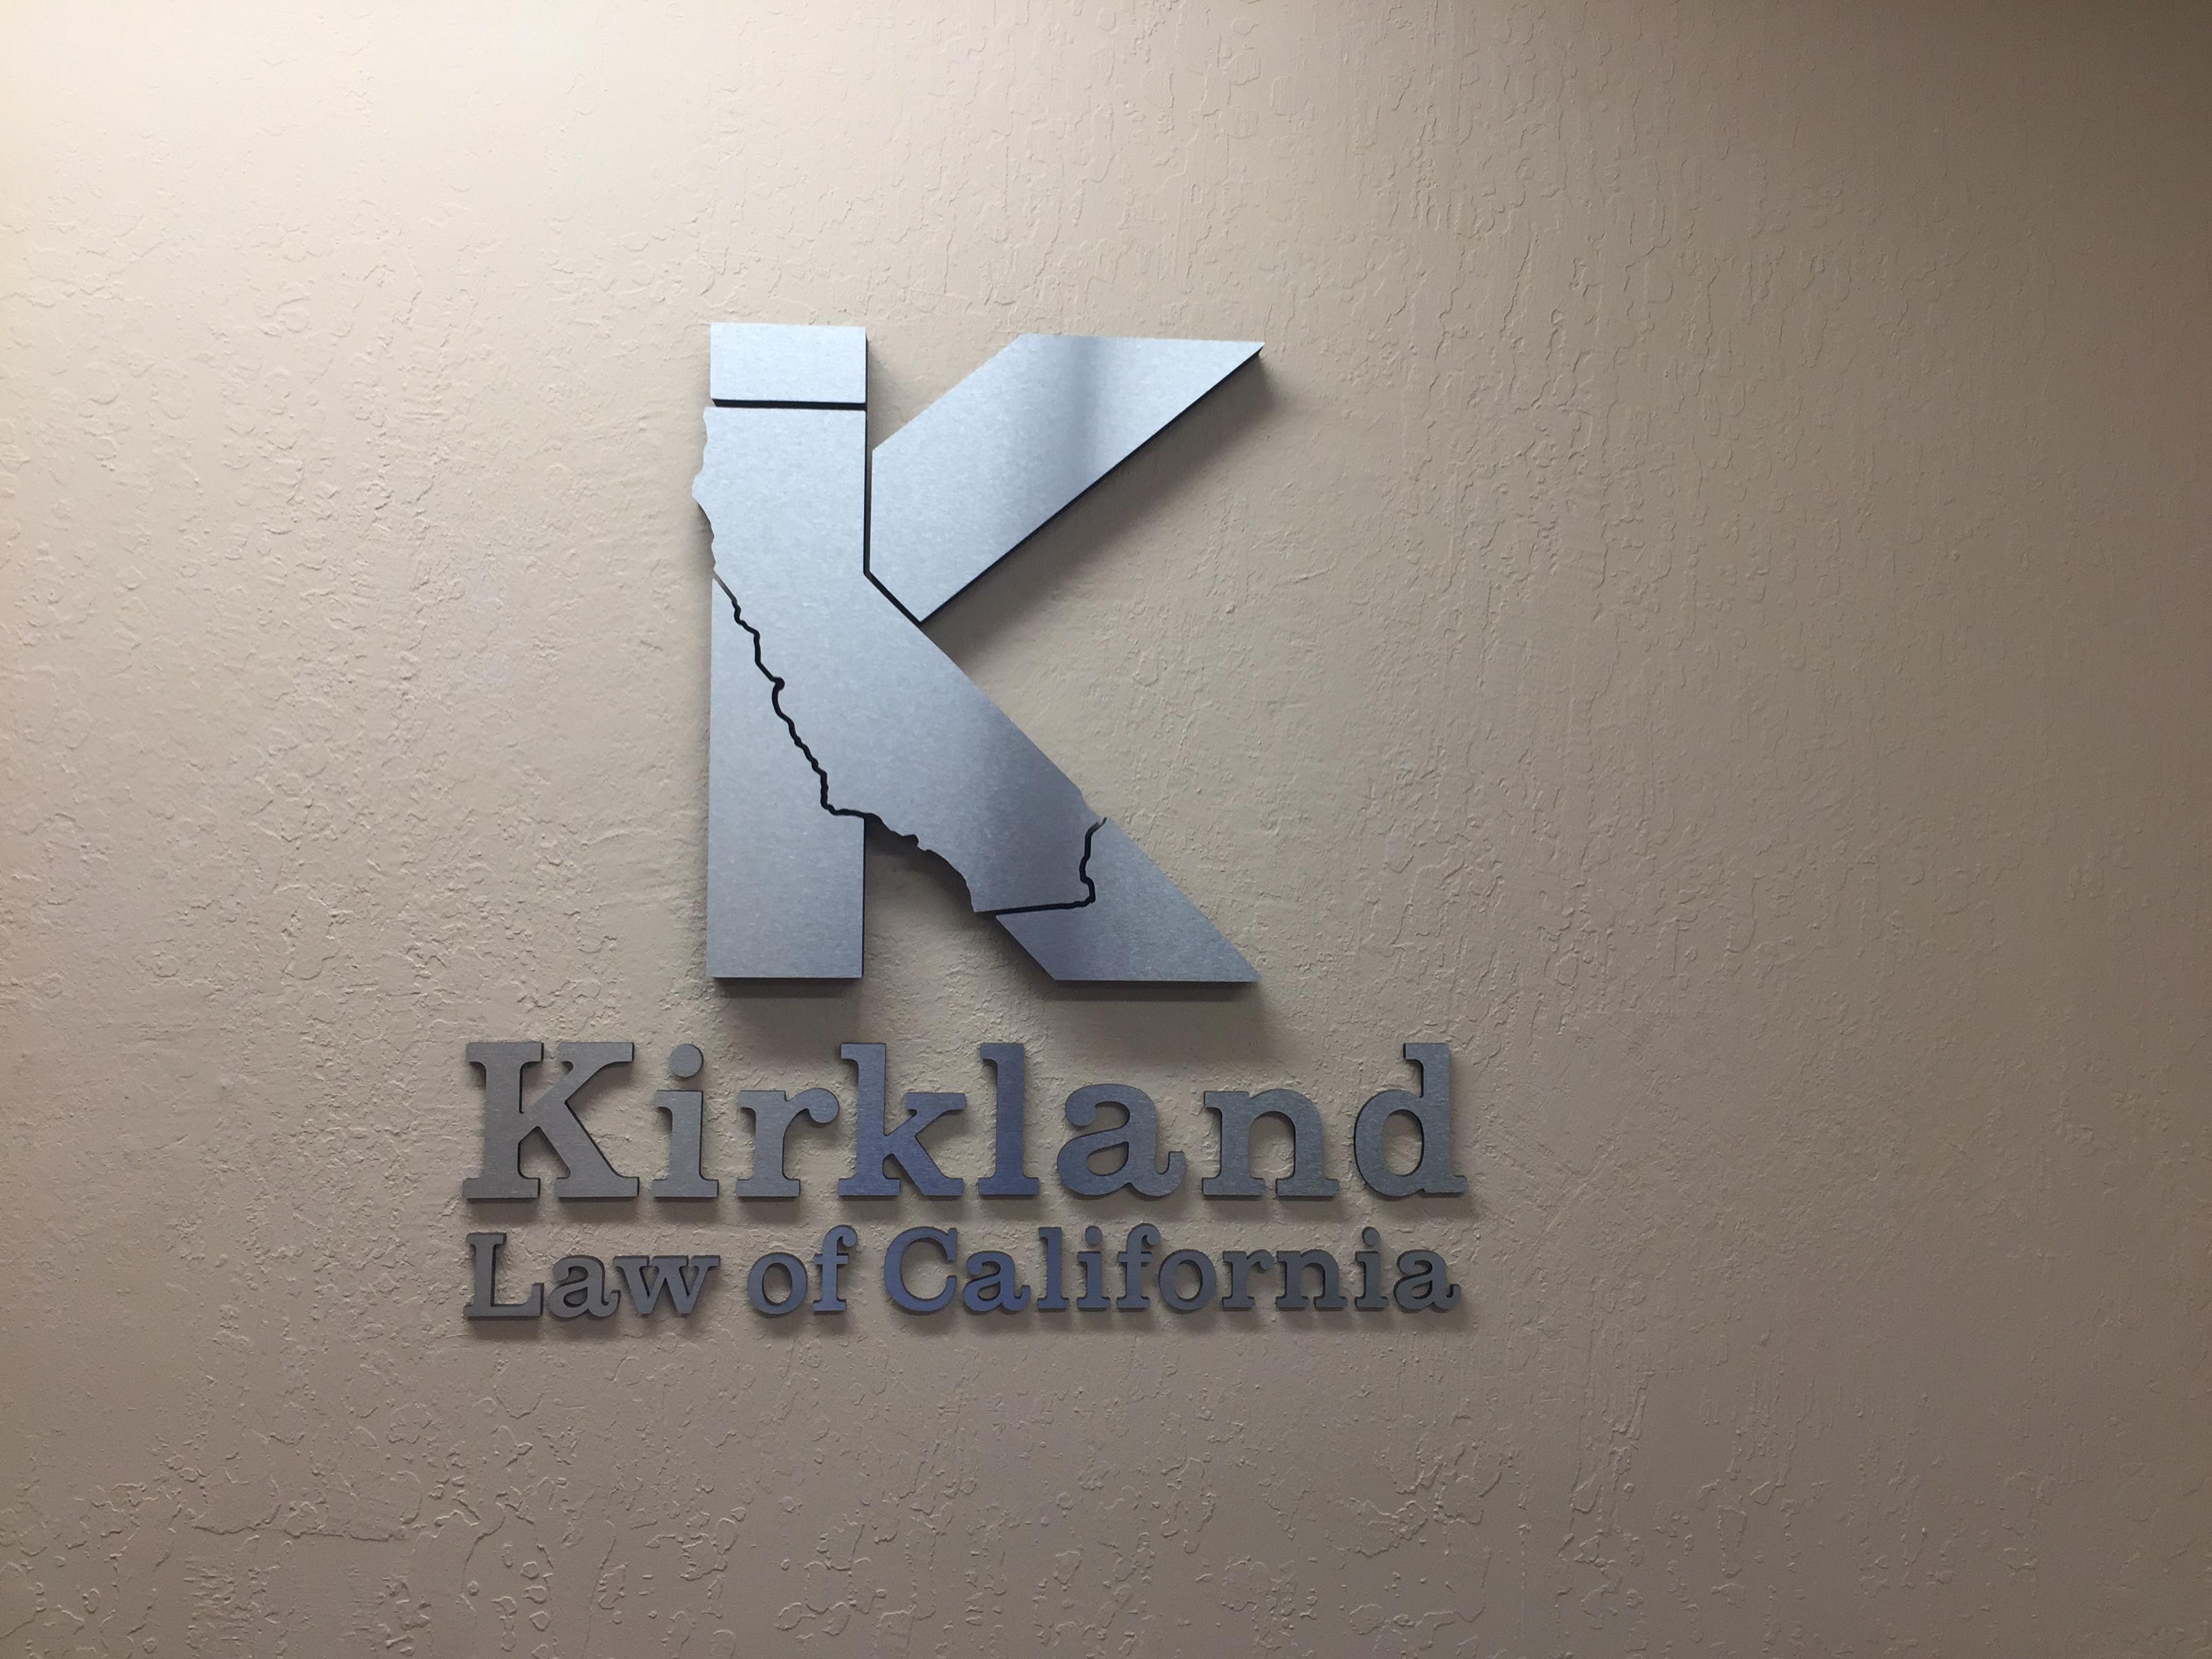 Kirkland Law of California